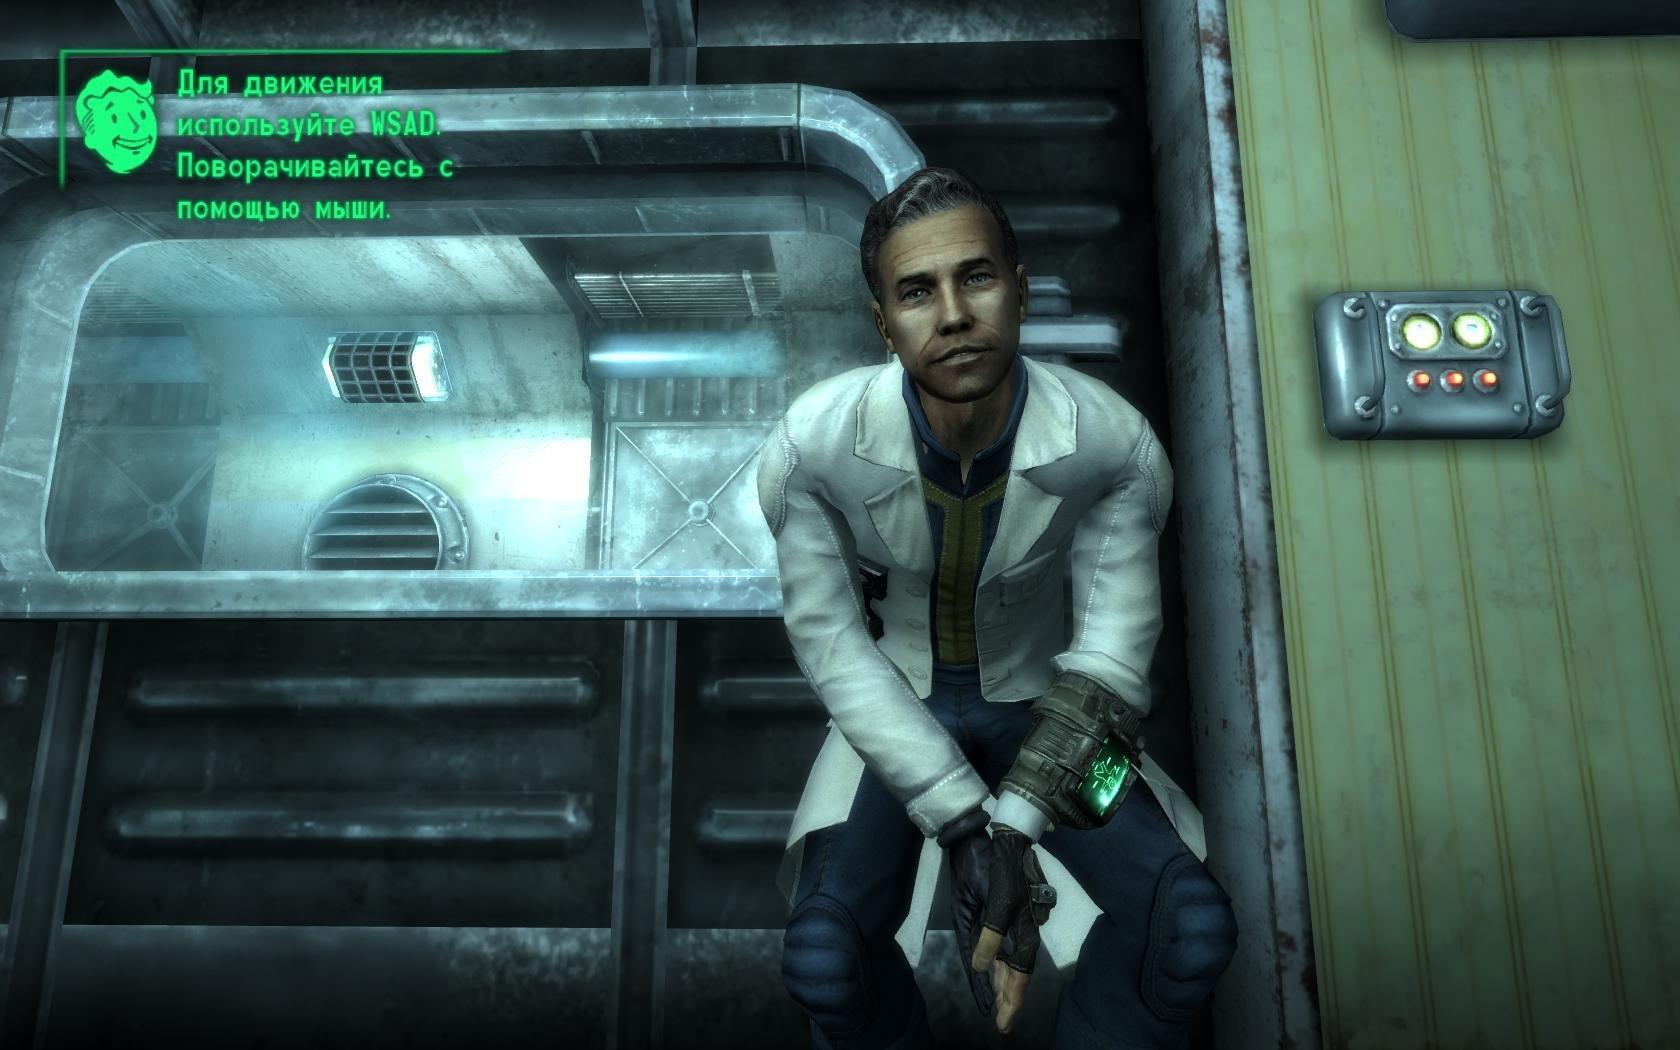 Fallout3 2018-10-01 19-57-25-07.jpg